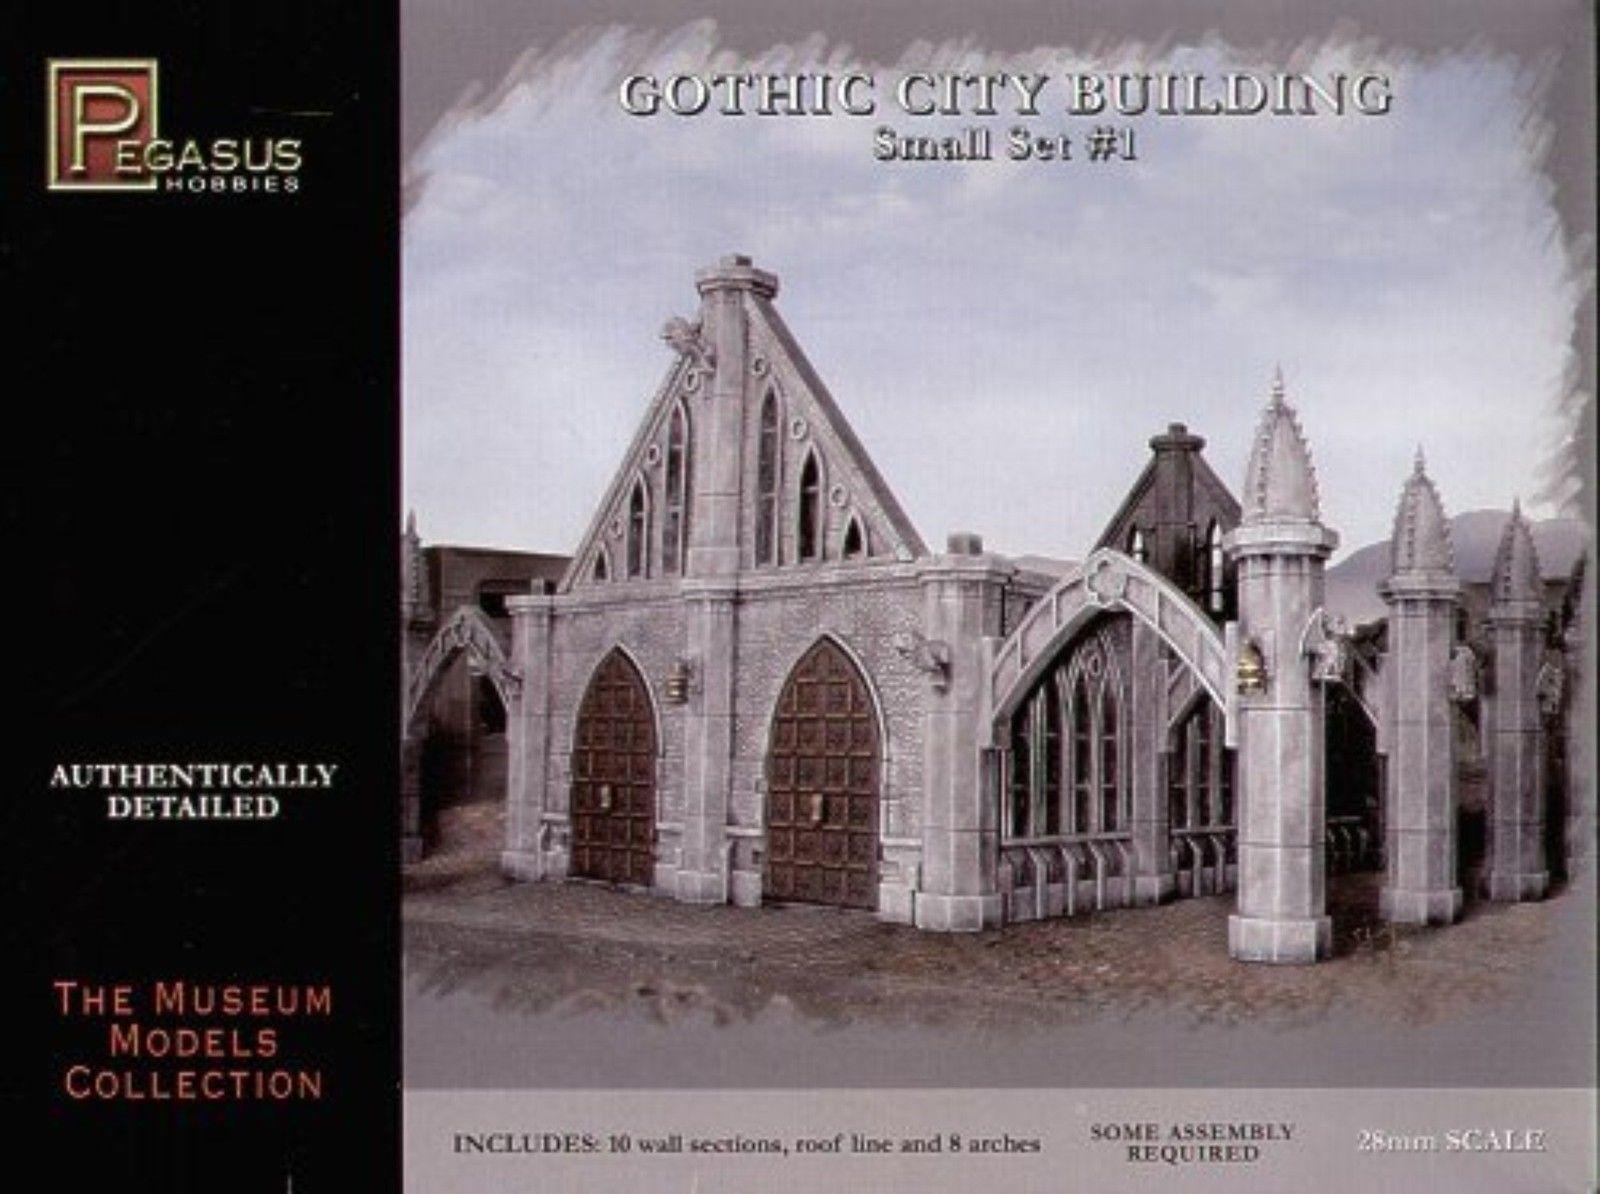 PEGASUS 4924 Gothic City byggnad SMALL SET 1 fantasi Sci -Fi Wargaming fri FkonstYG